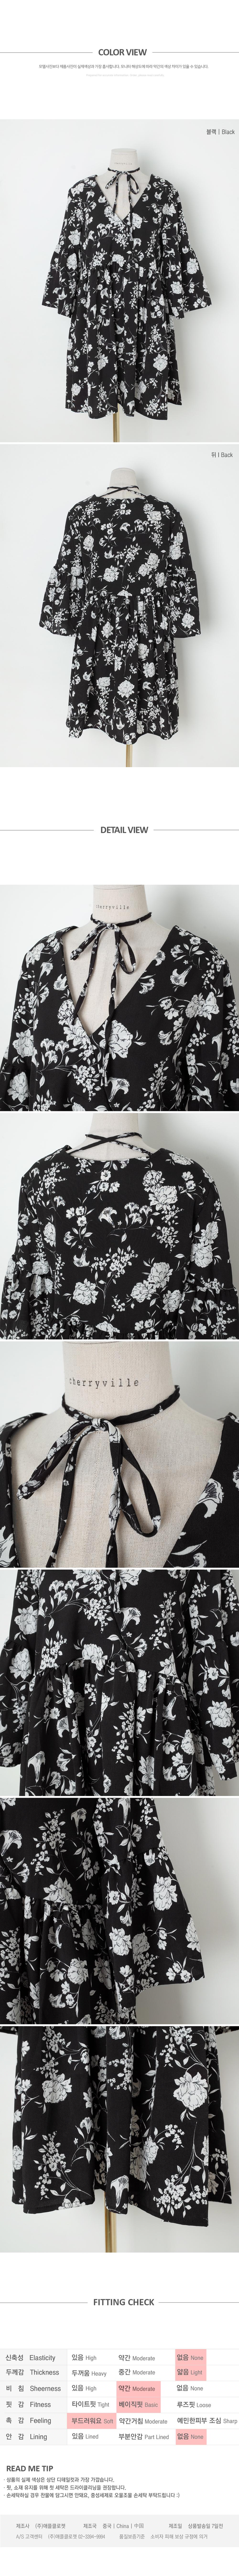 Flower loose dress